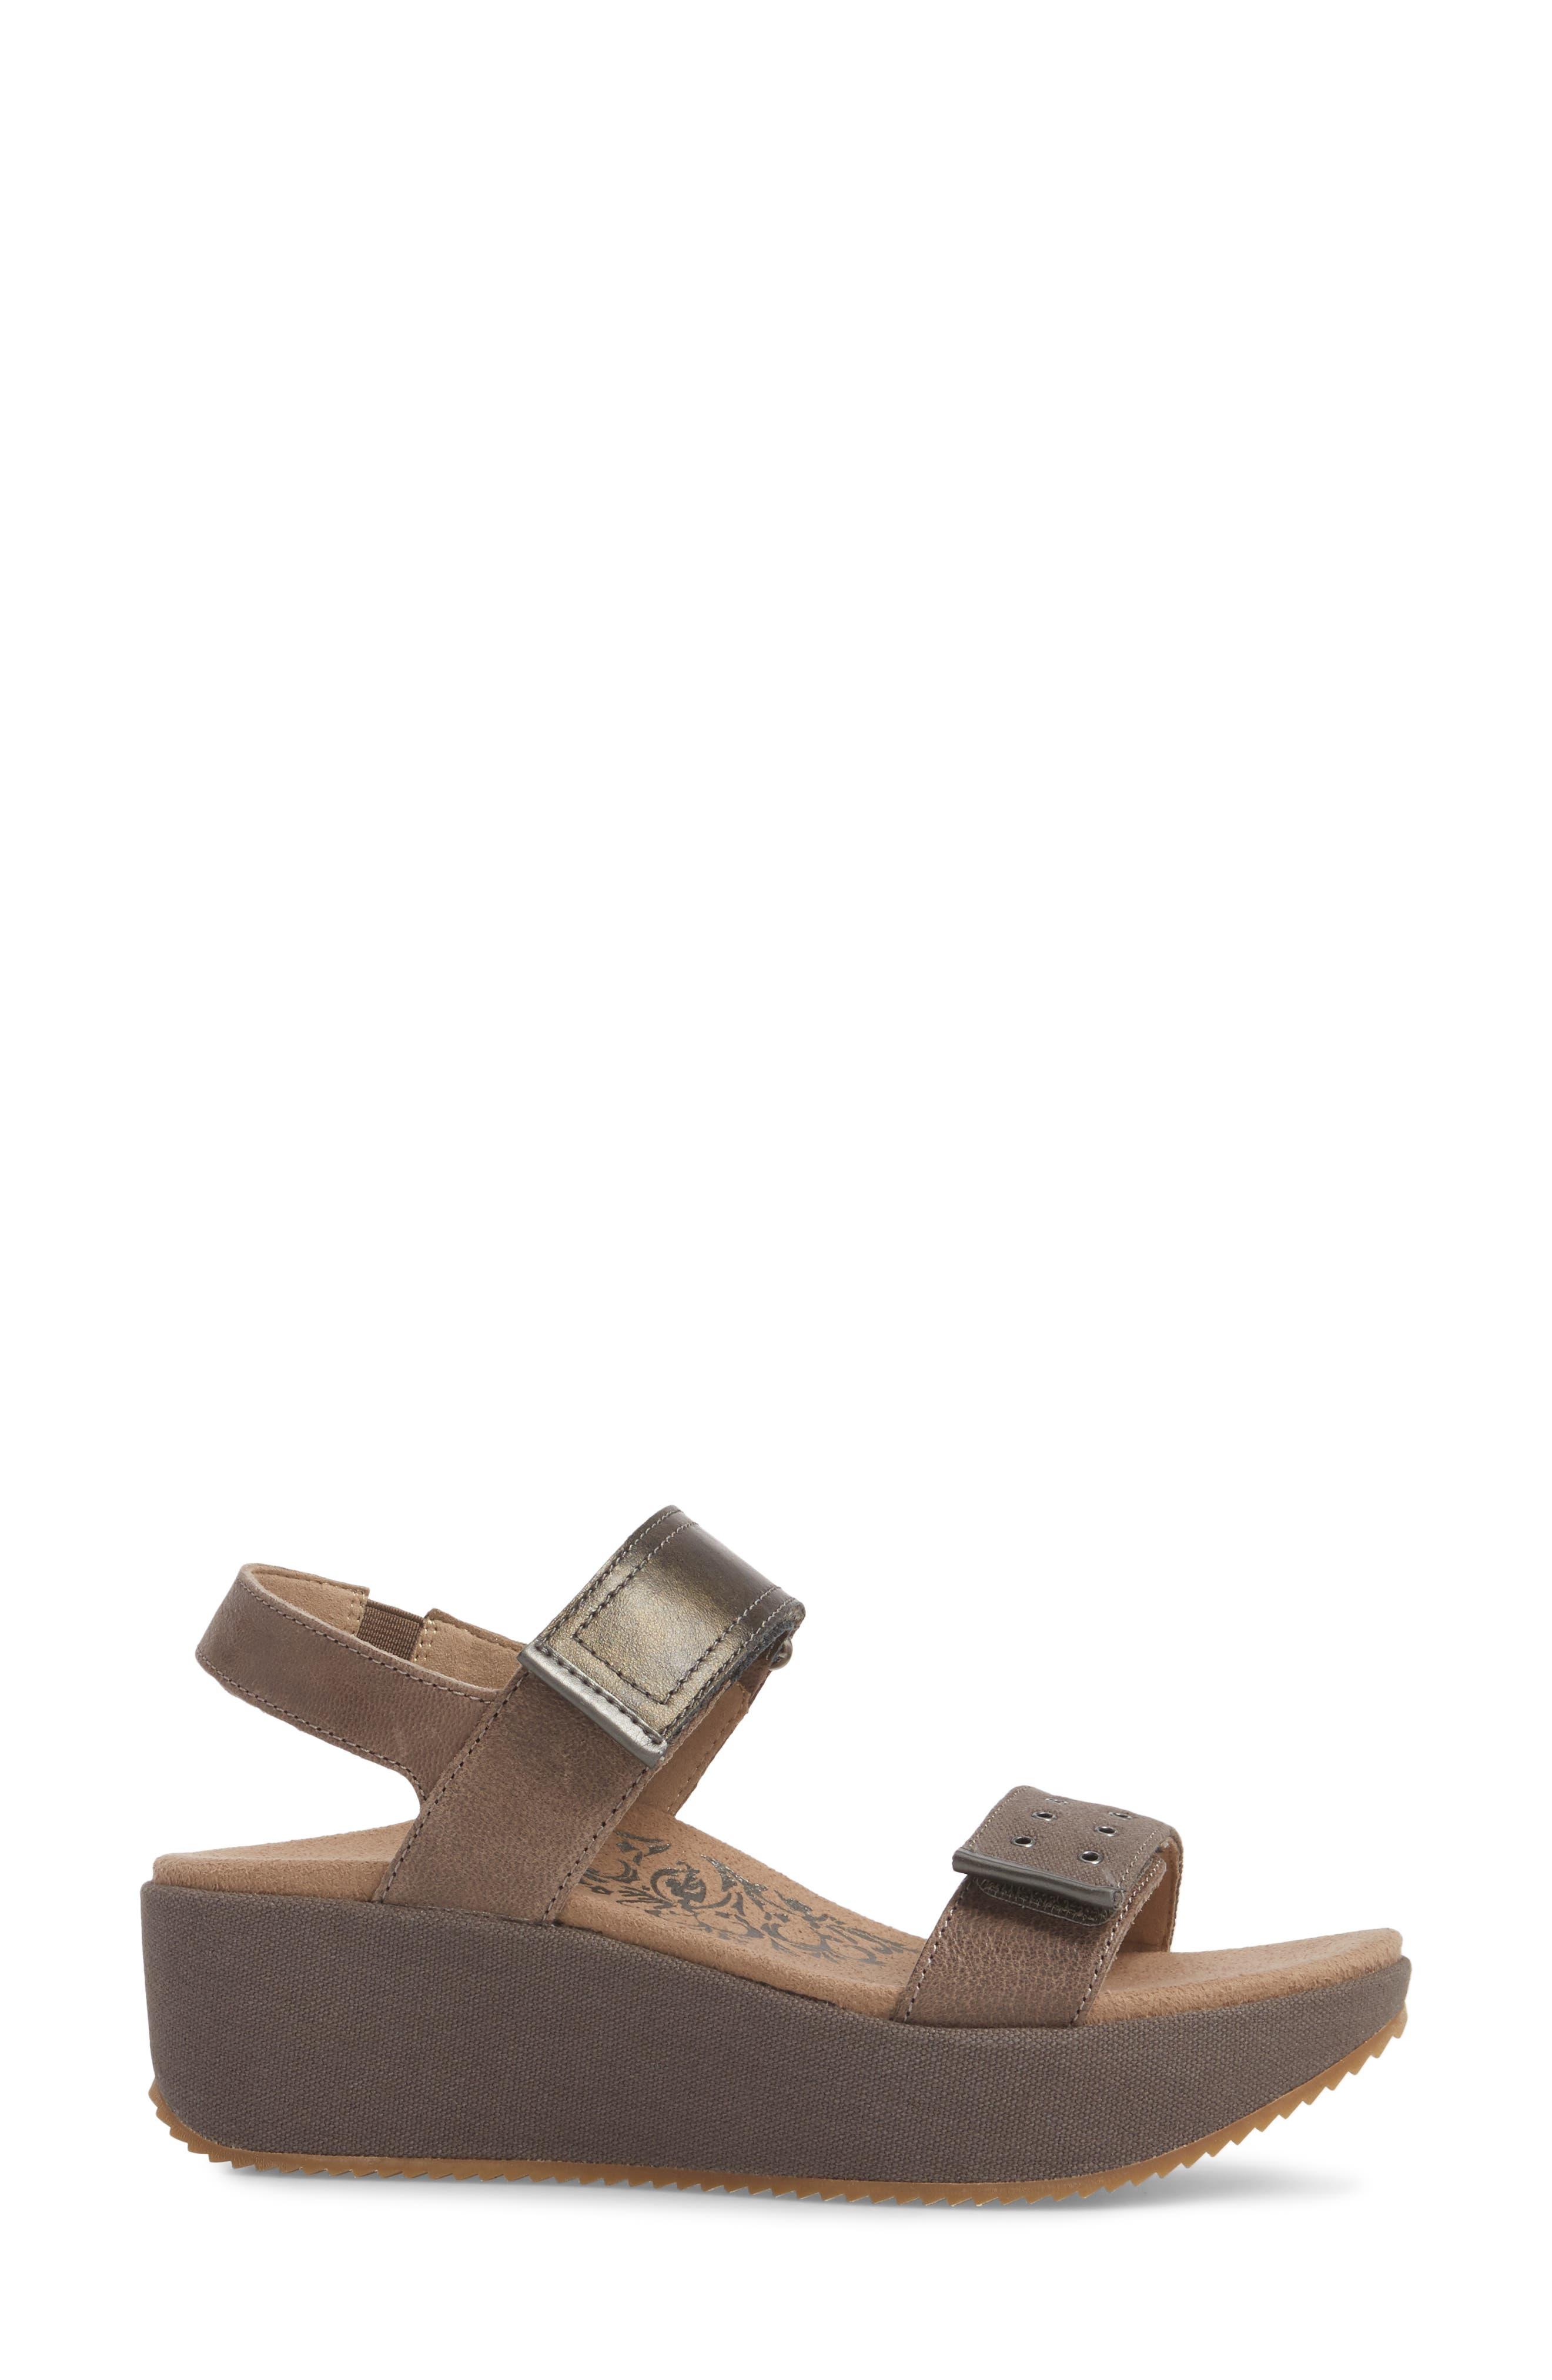 Tiffany Wedge Sandal,                             Alternate thumbnail 3, color,                             Stone Leather